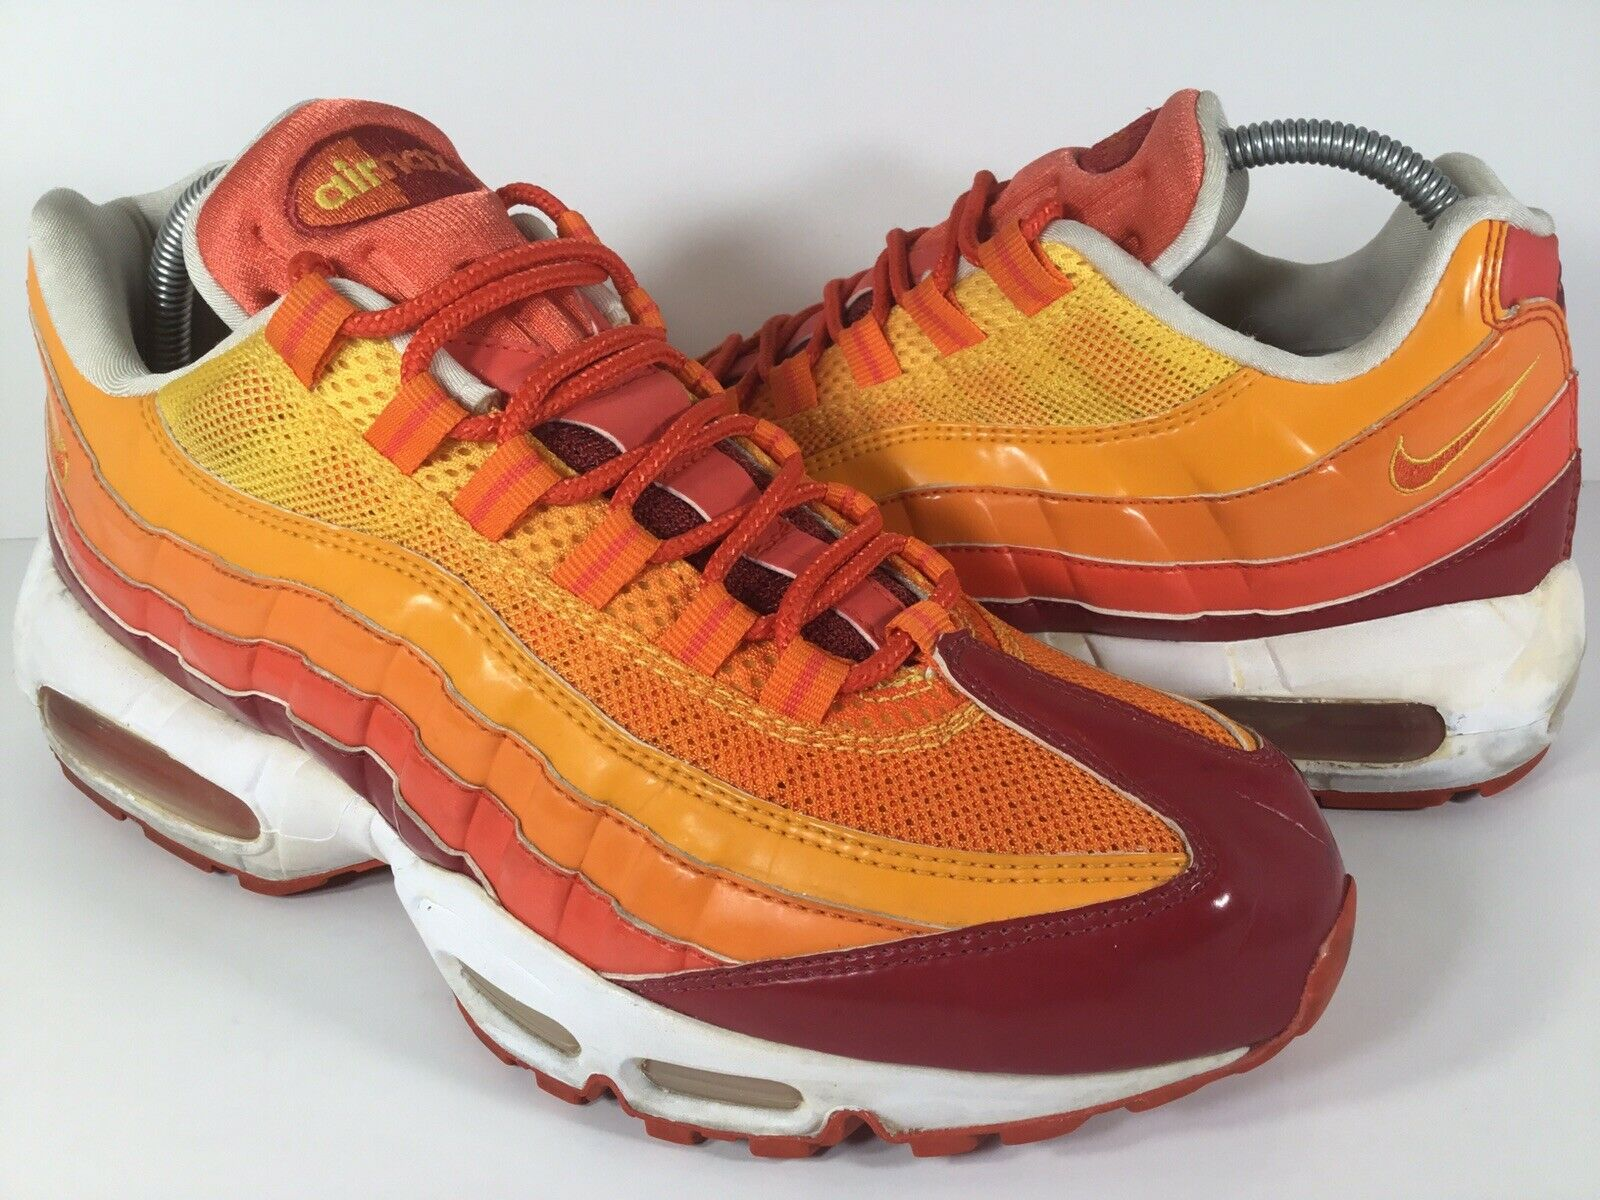 Nike Air Max 95 Human Torch orange Yellow Red White Size 8.5 Rare 609048-681